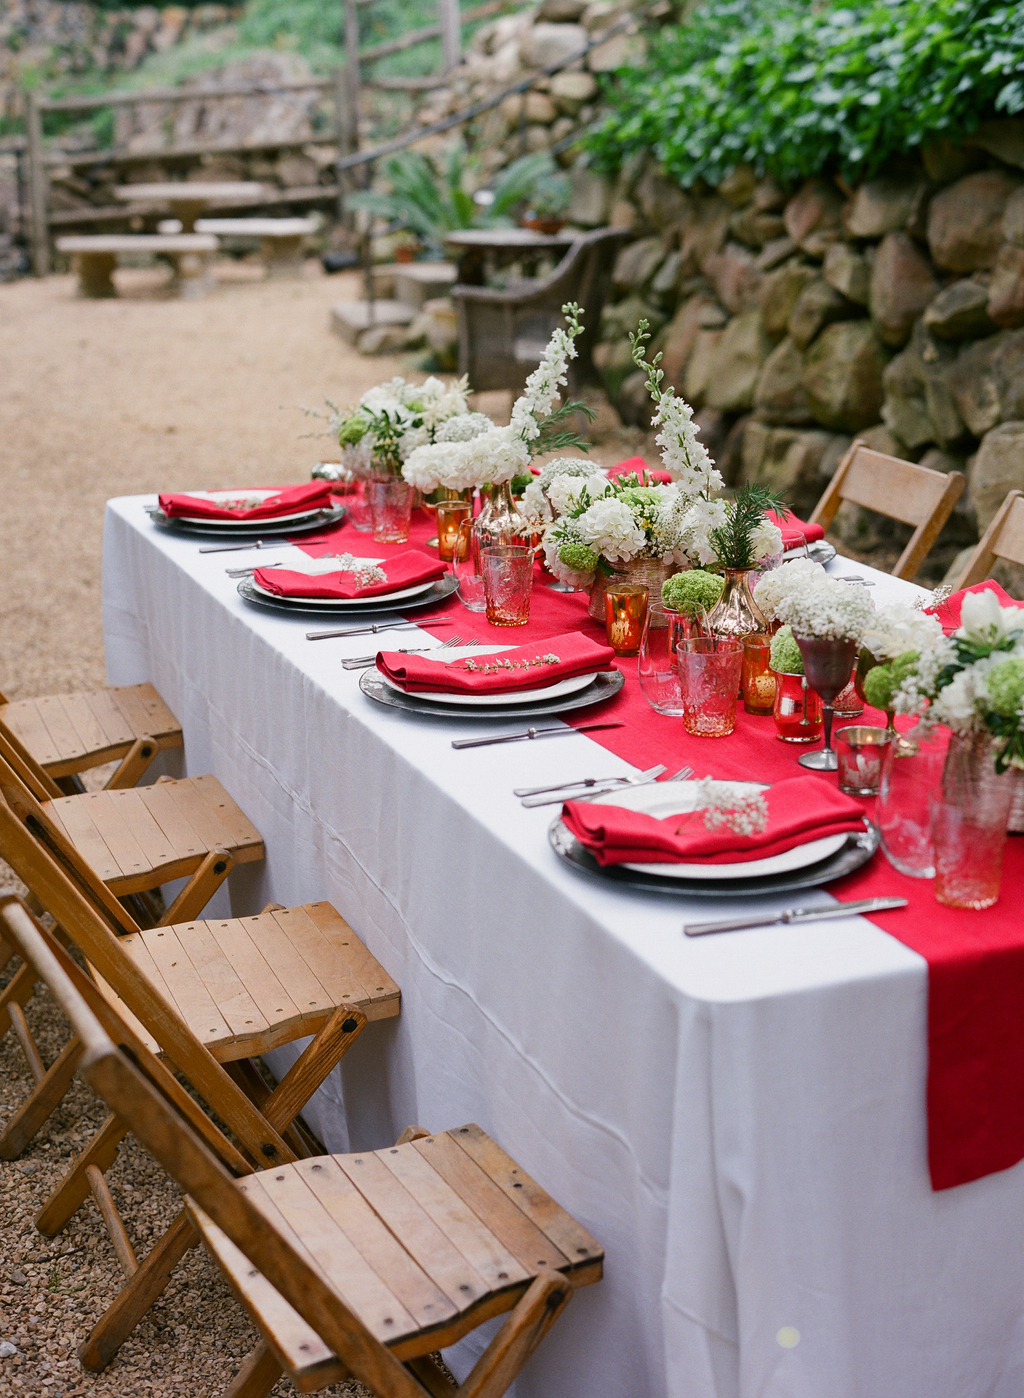 Styled-wedding-santa-barbara-chic-beaux-arts-photographie-italian-bohemian-wedding-venue-table-setting-red-white-flowers-antique-glass-094.full